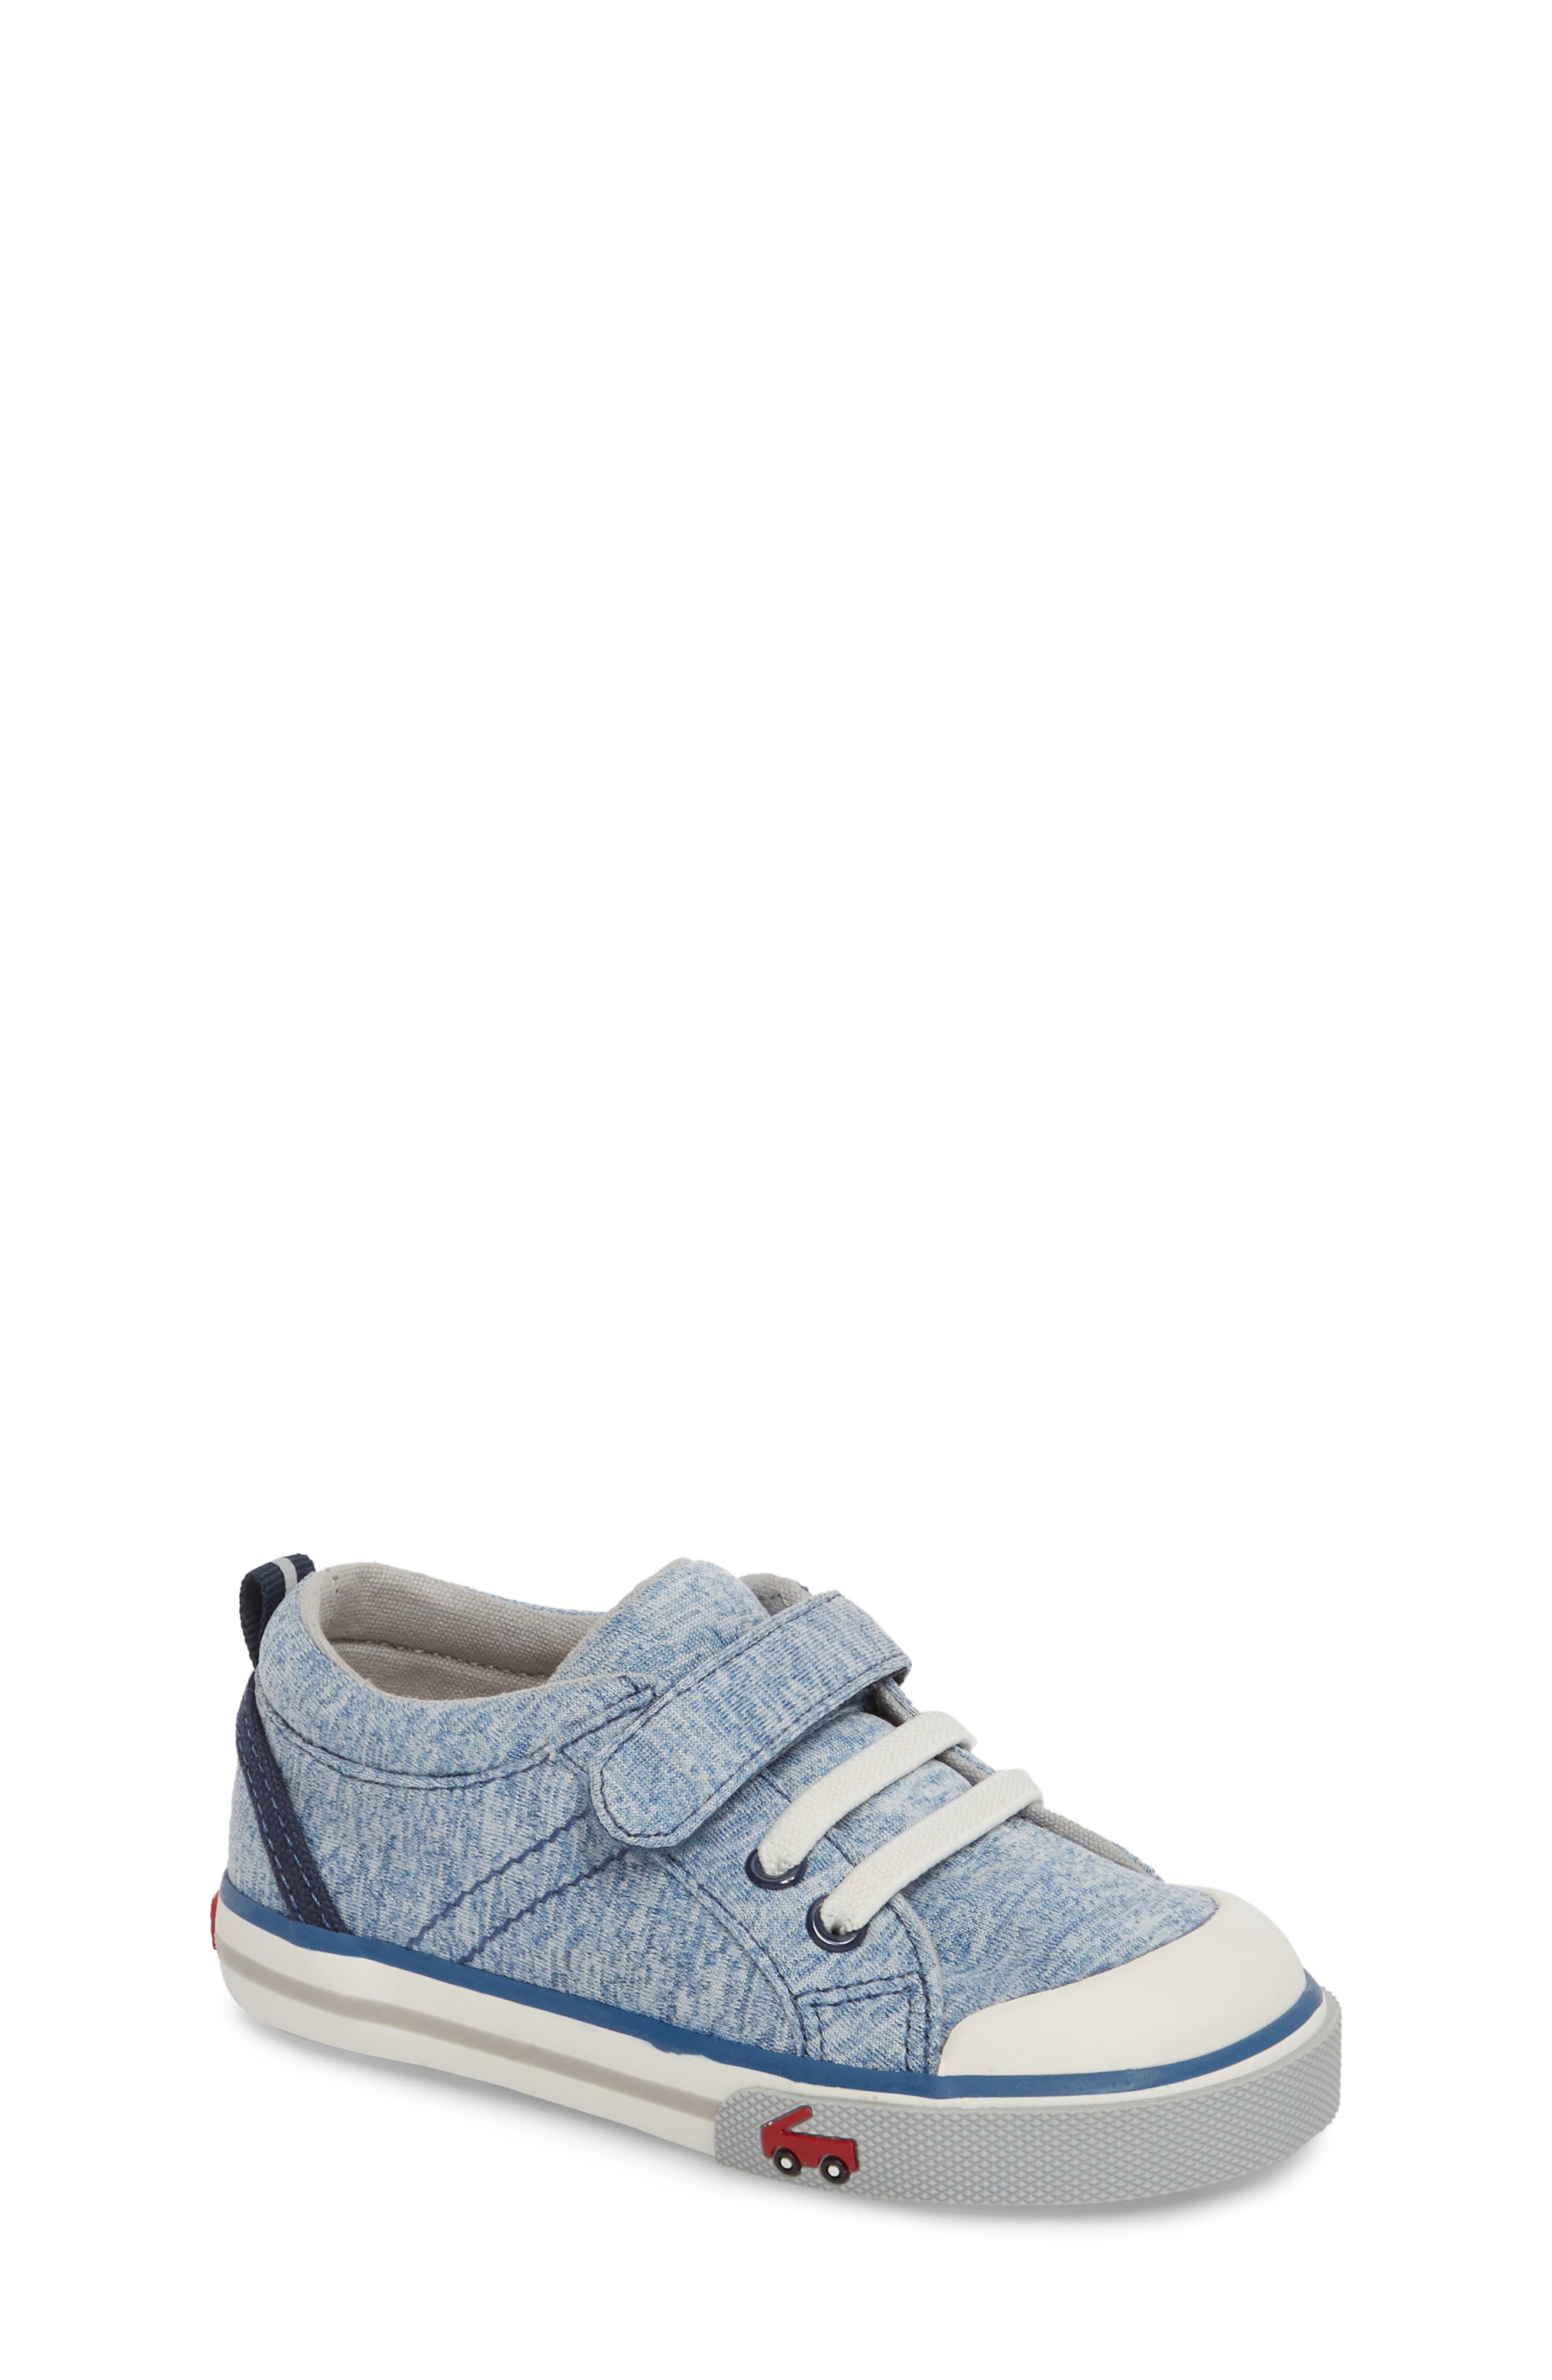 Tanner Sneaker,                             Main thumbnail 1, color,                             400